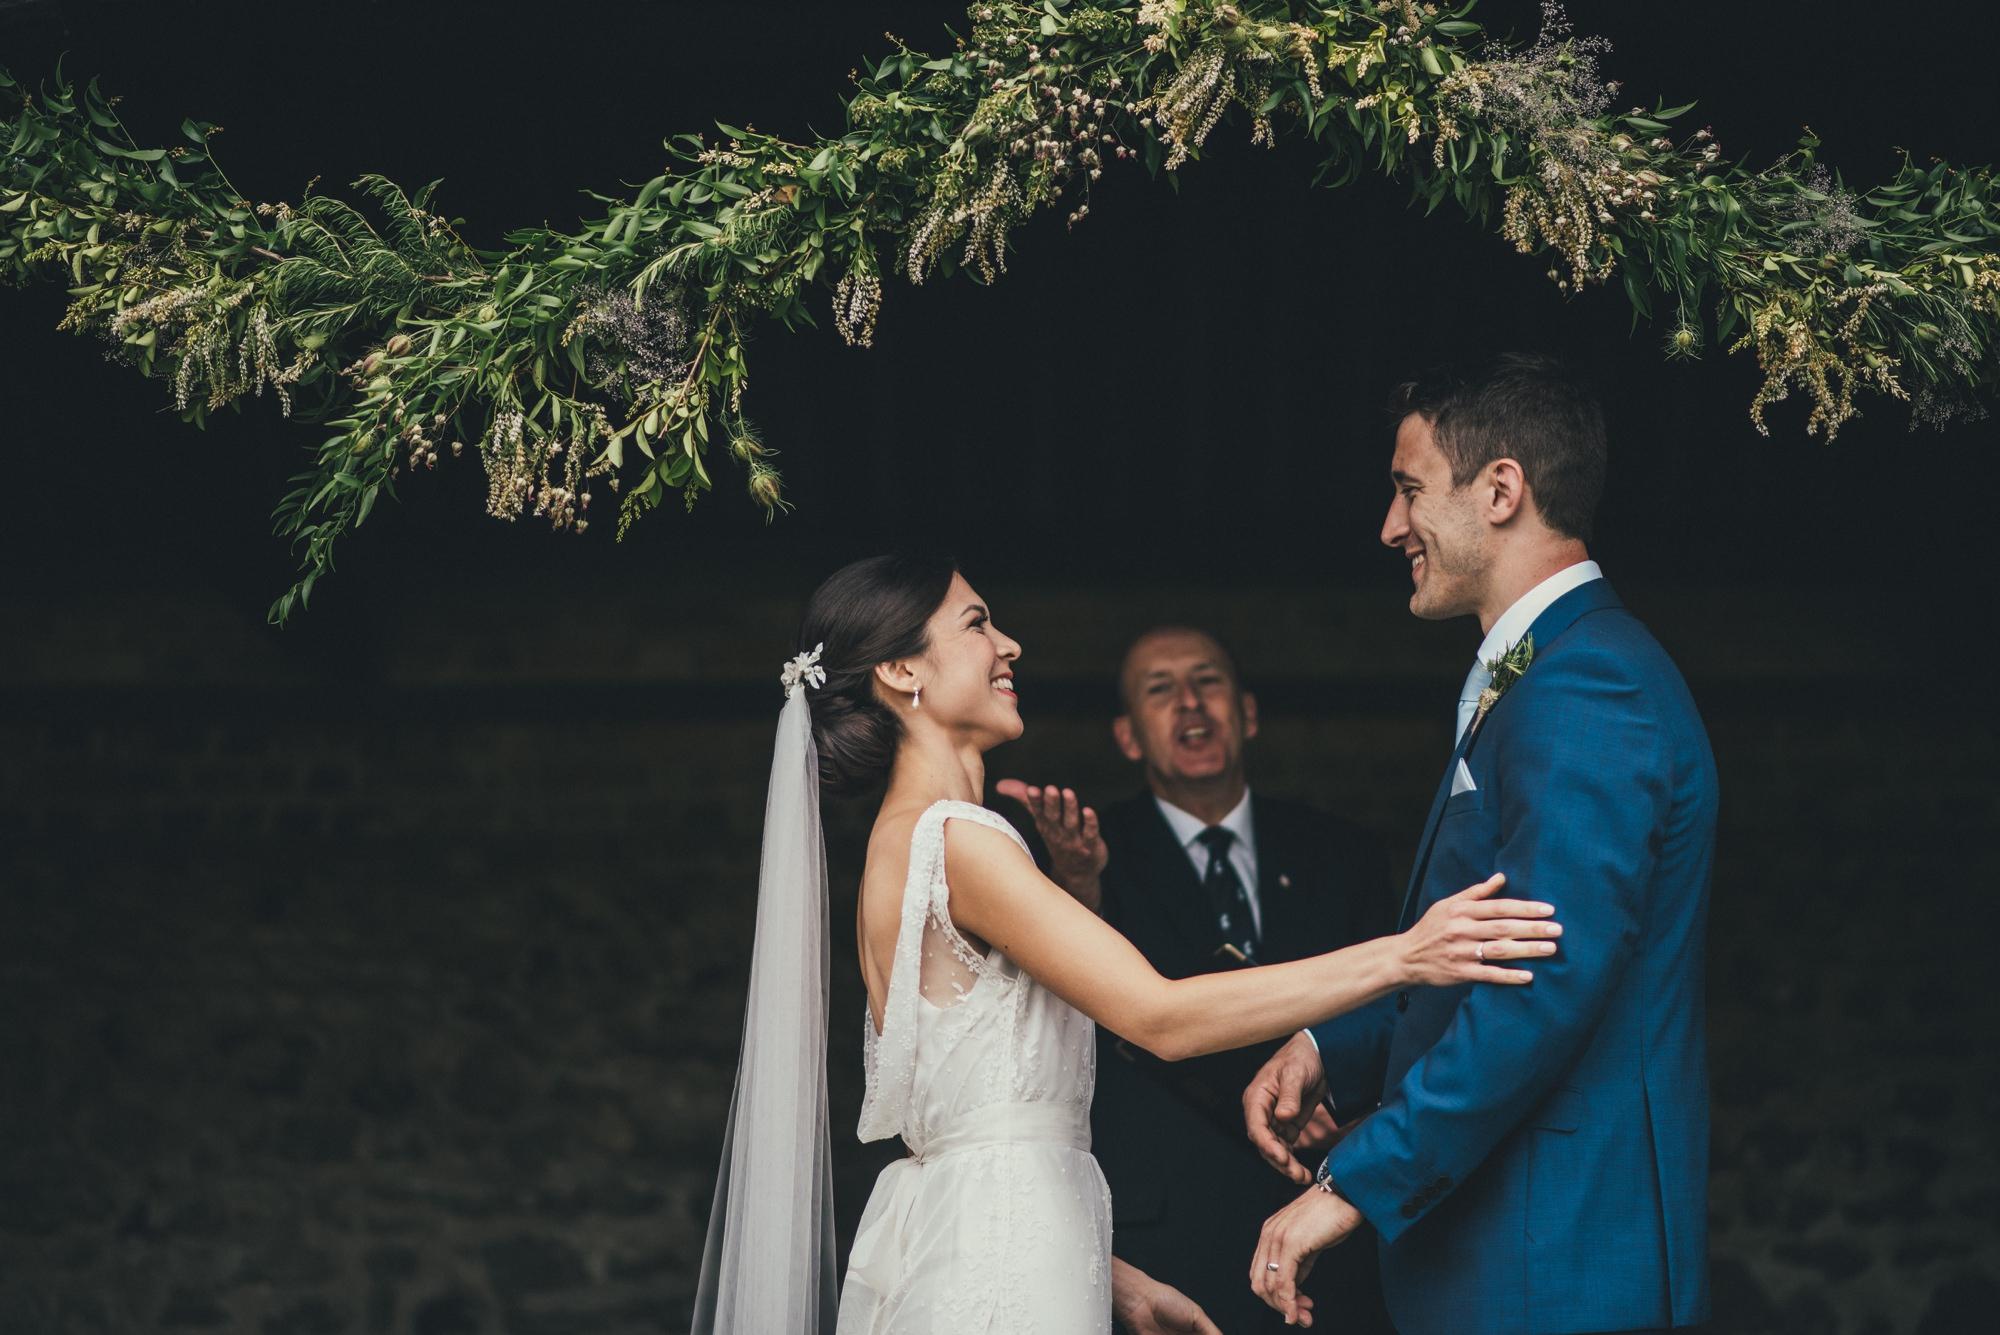 Best wedding photographer manchester_0010